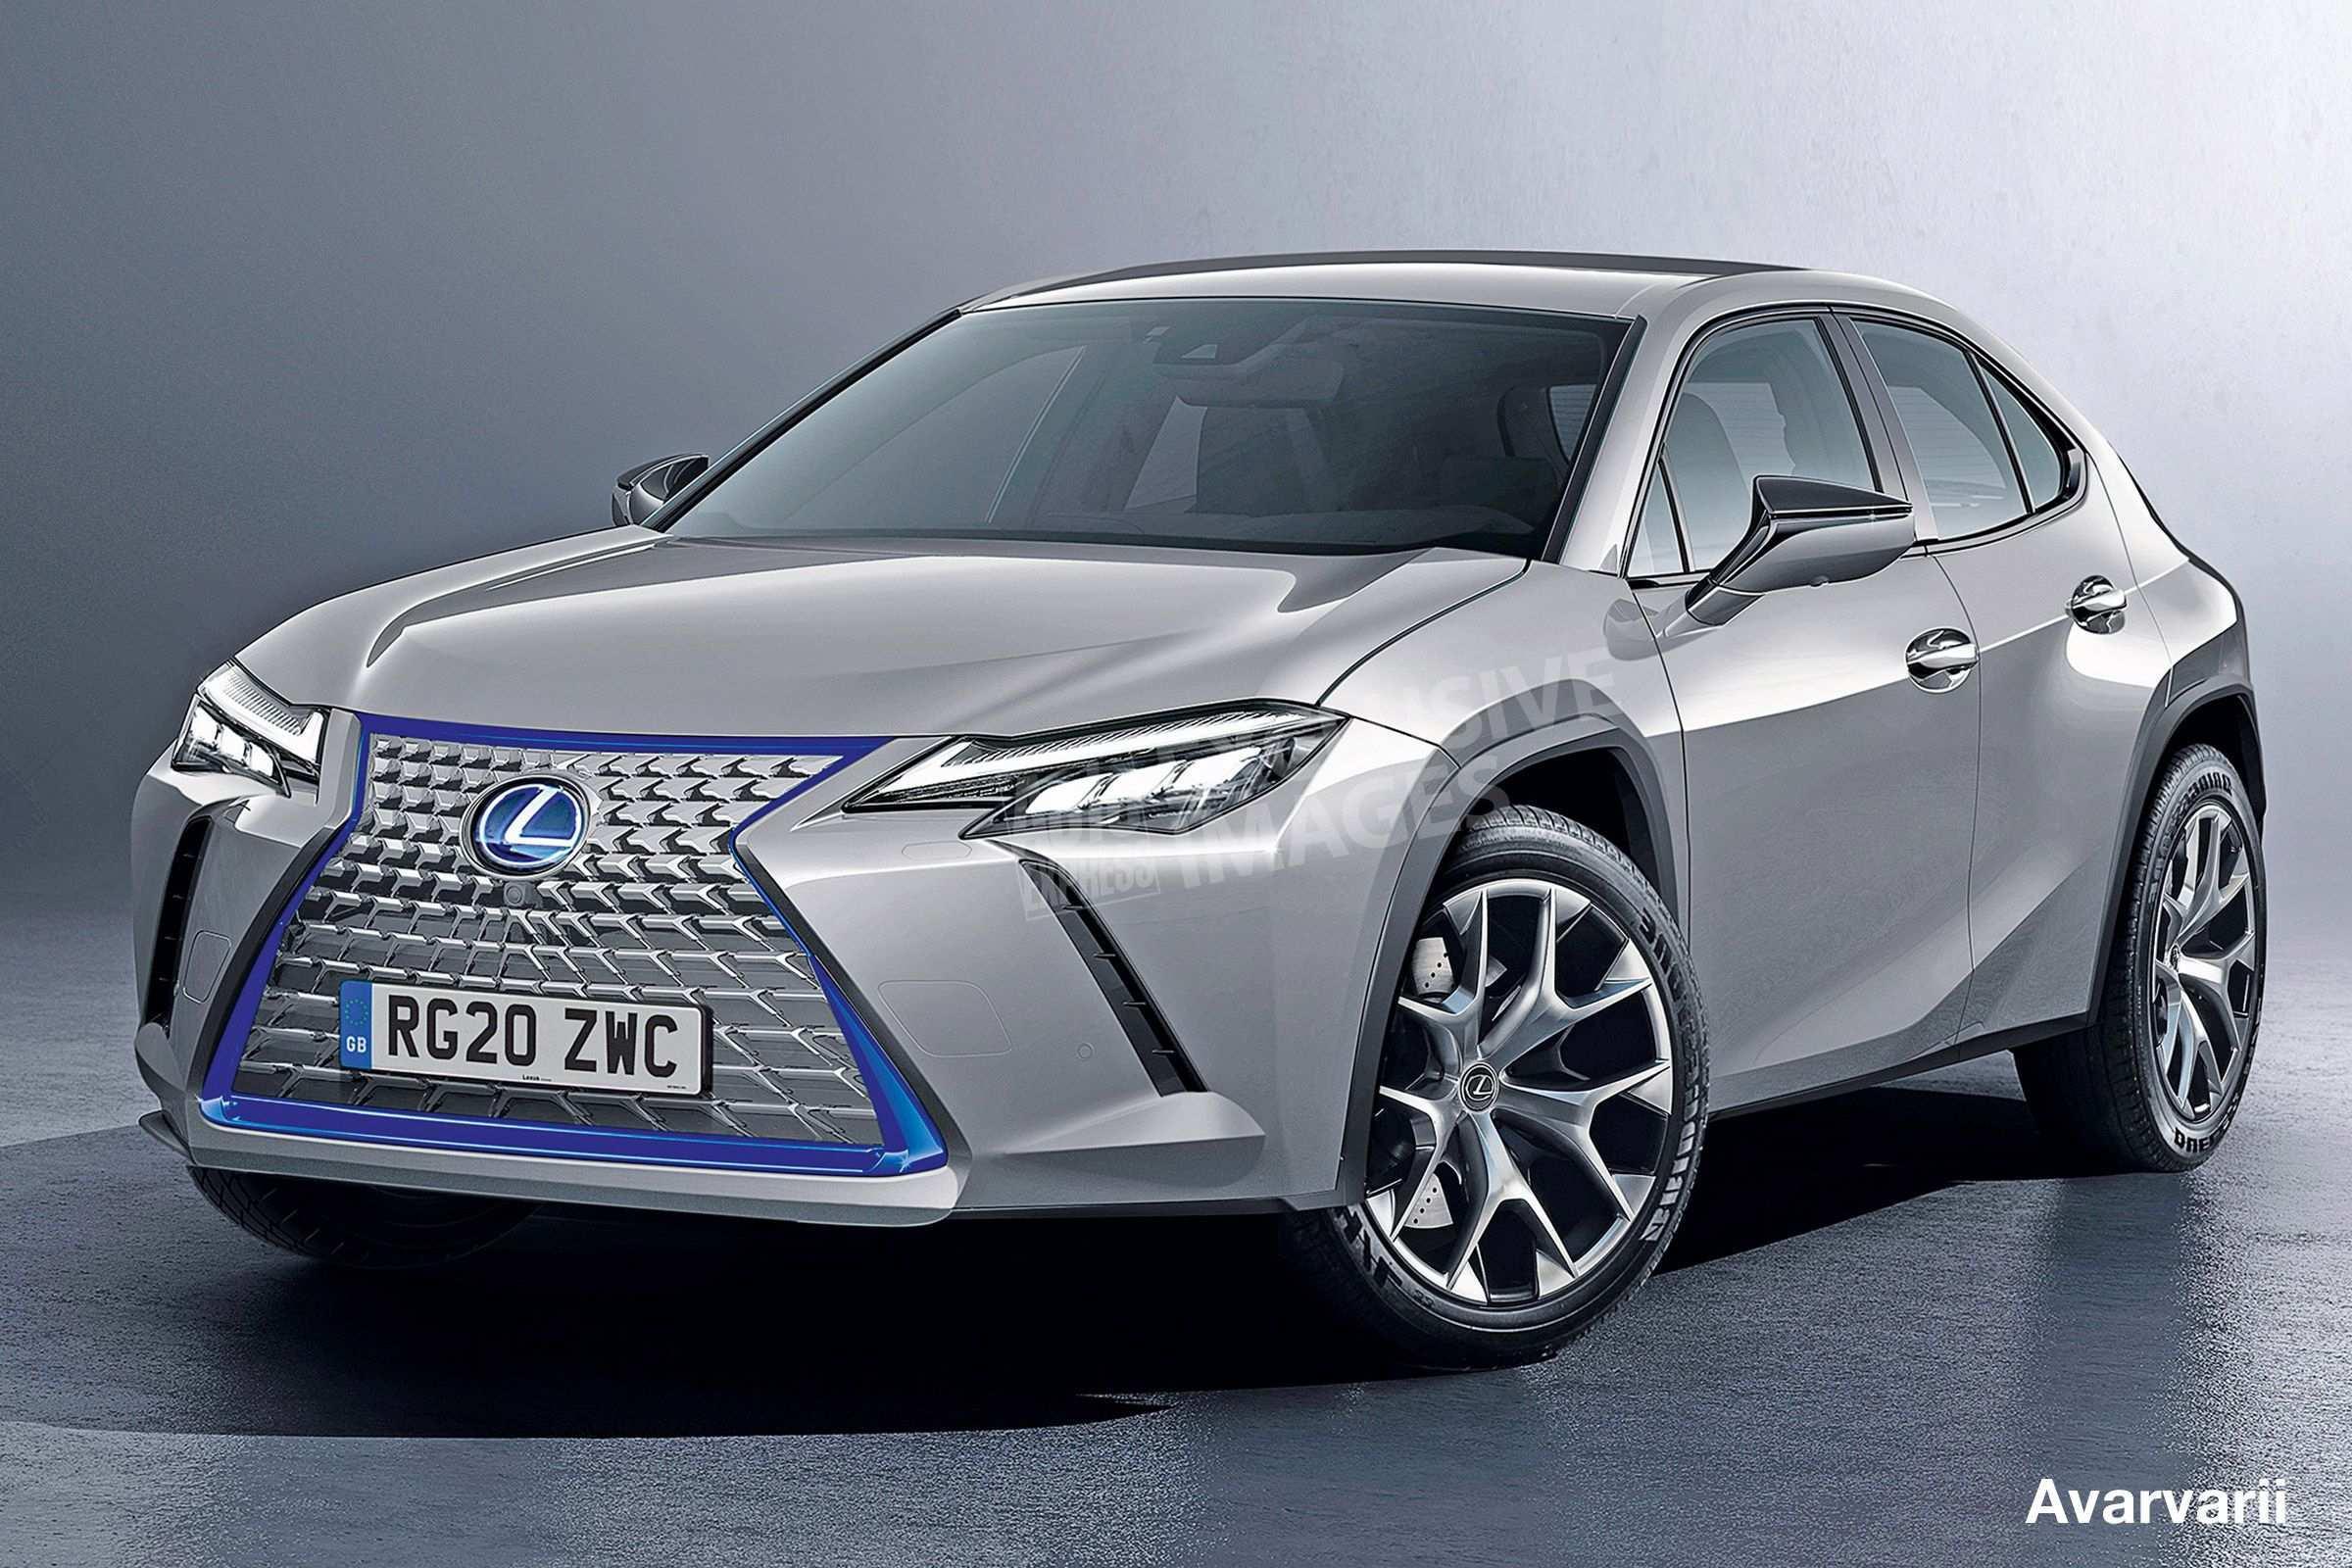 48 New Xe Lexus Es 2020 Interior by Xe Lexus Es 2020